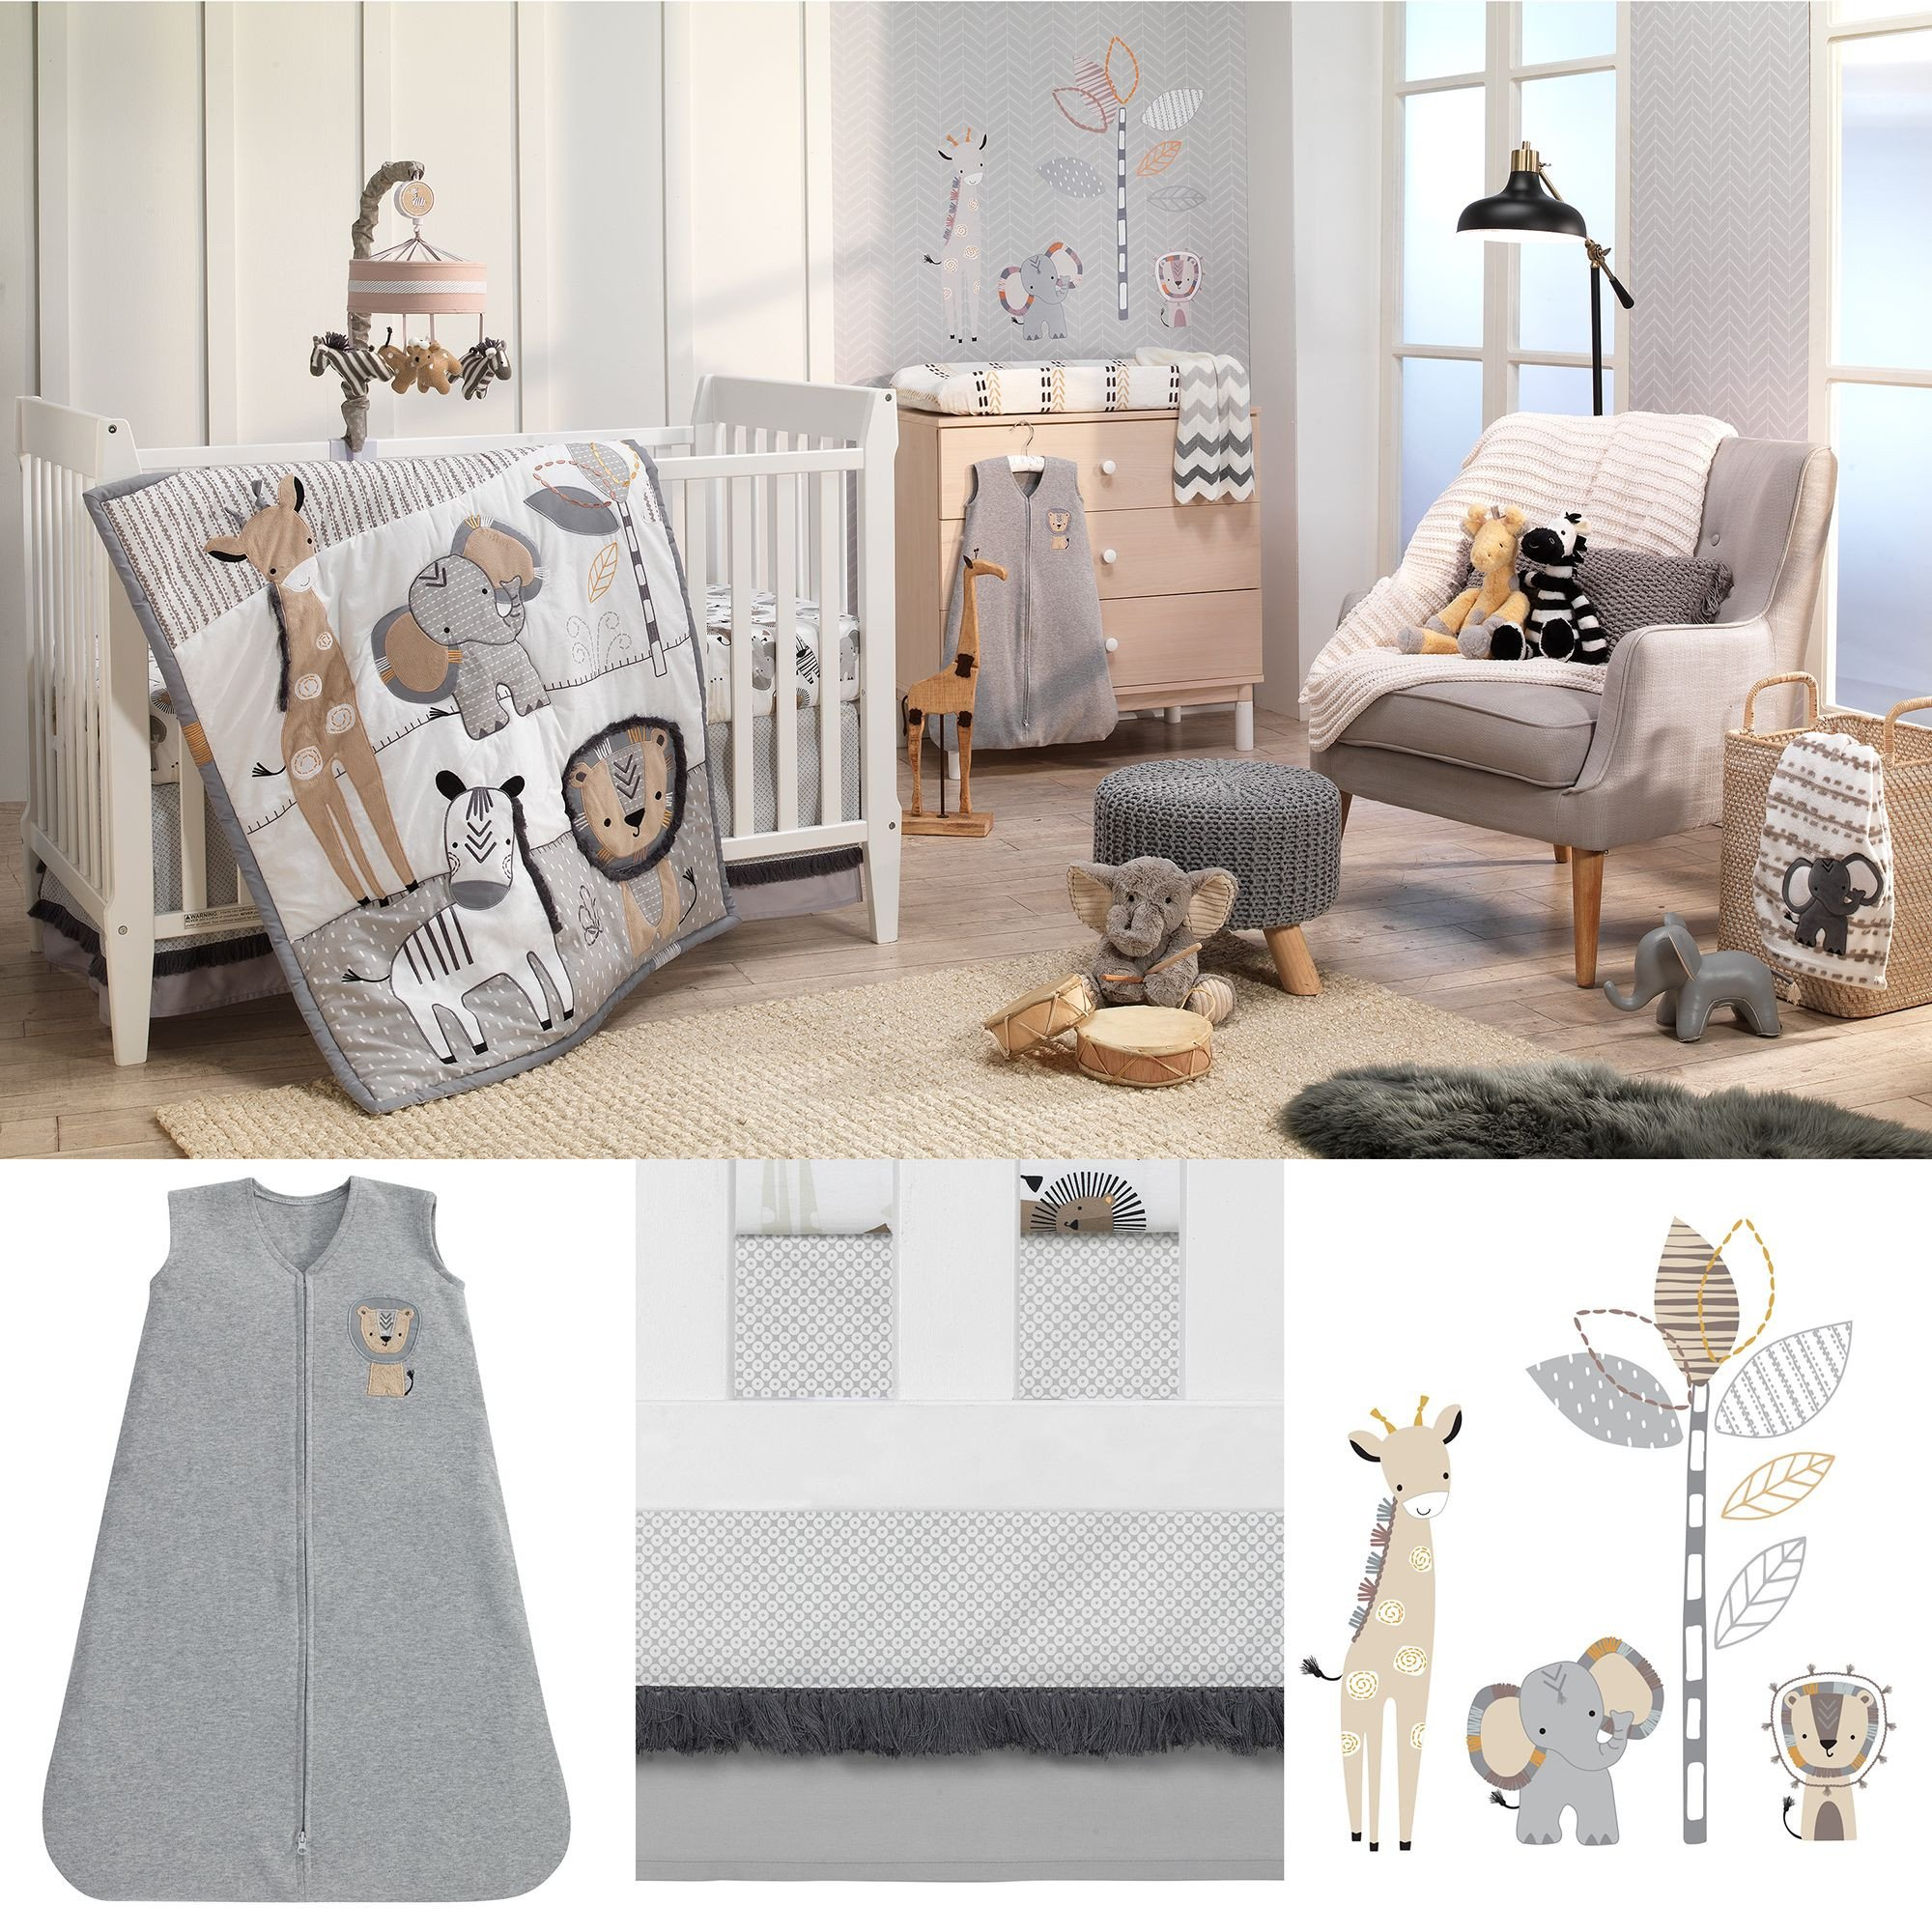 Grey and Tan Bedroom Elegant Jungle Safari Gray Tan White Nursery 6 Piece Baby Crib